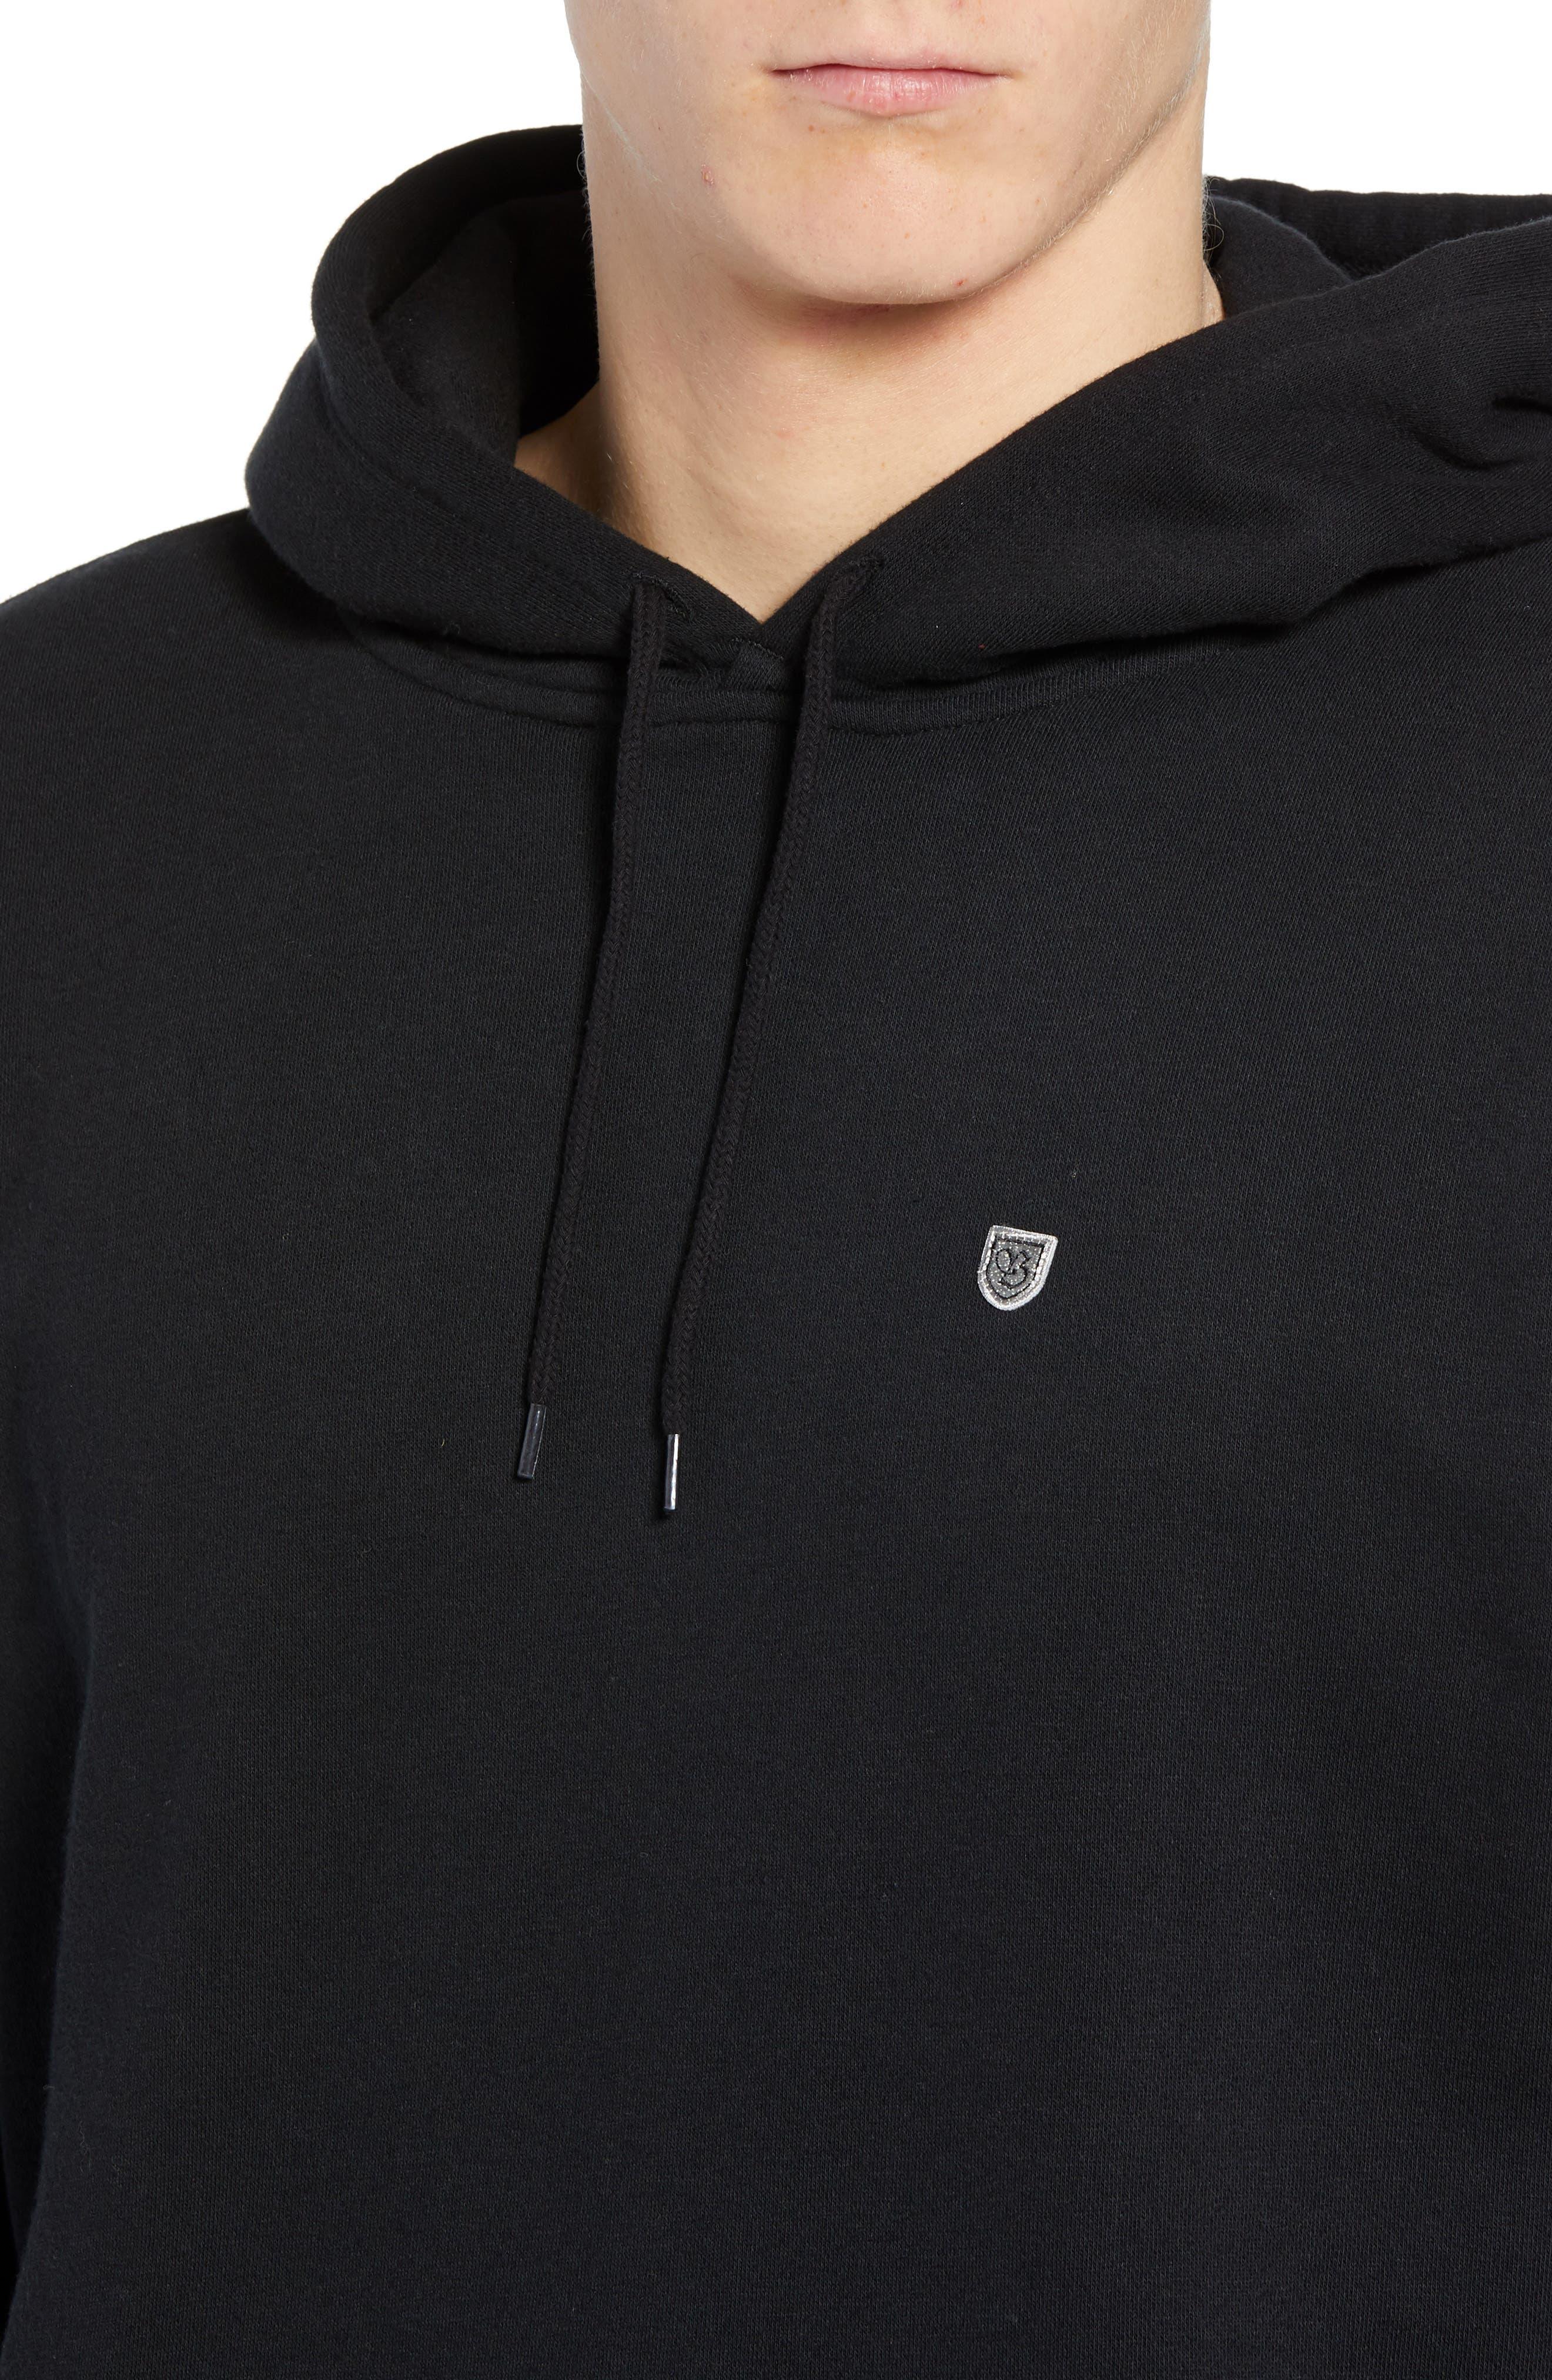 B-Shield Hooded Sweatshirt,                             Alternate thumbnail 4, color,                             001